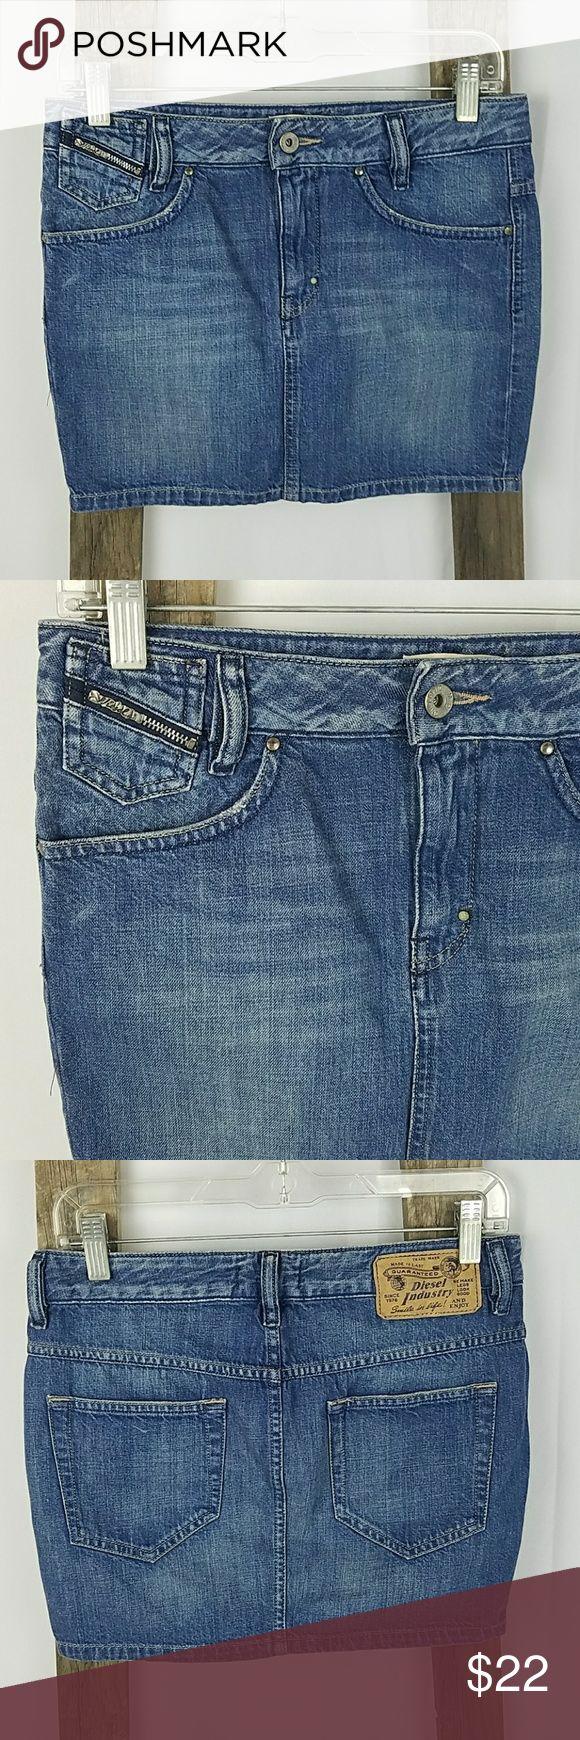 "Diesel women 25 blue jeans denim pencil mini skirt Diesel women 25 blue jeans denim mini skirt, 100% cotton.  Waist side to side: 15"" Length: 13"" Diesel Skirts Pencil"